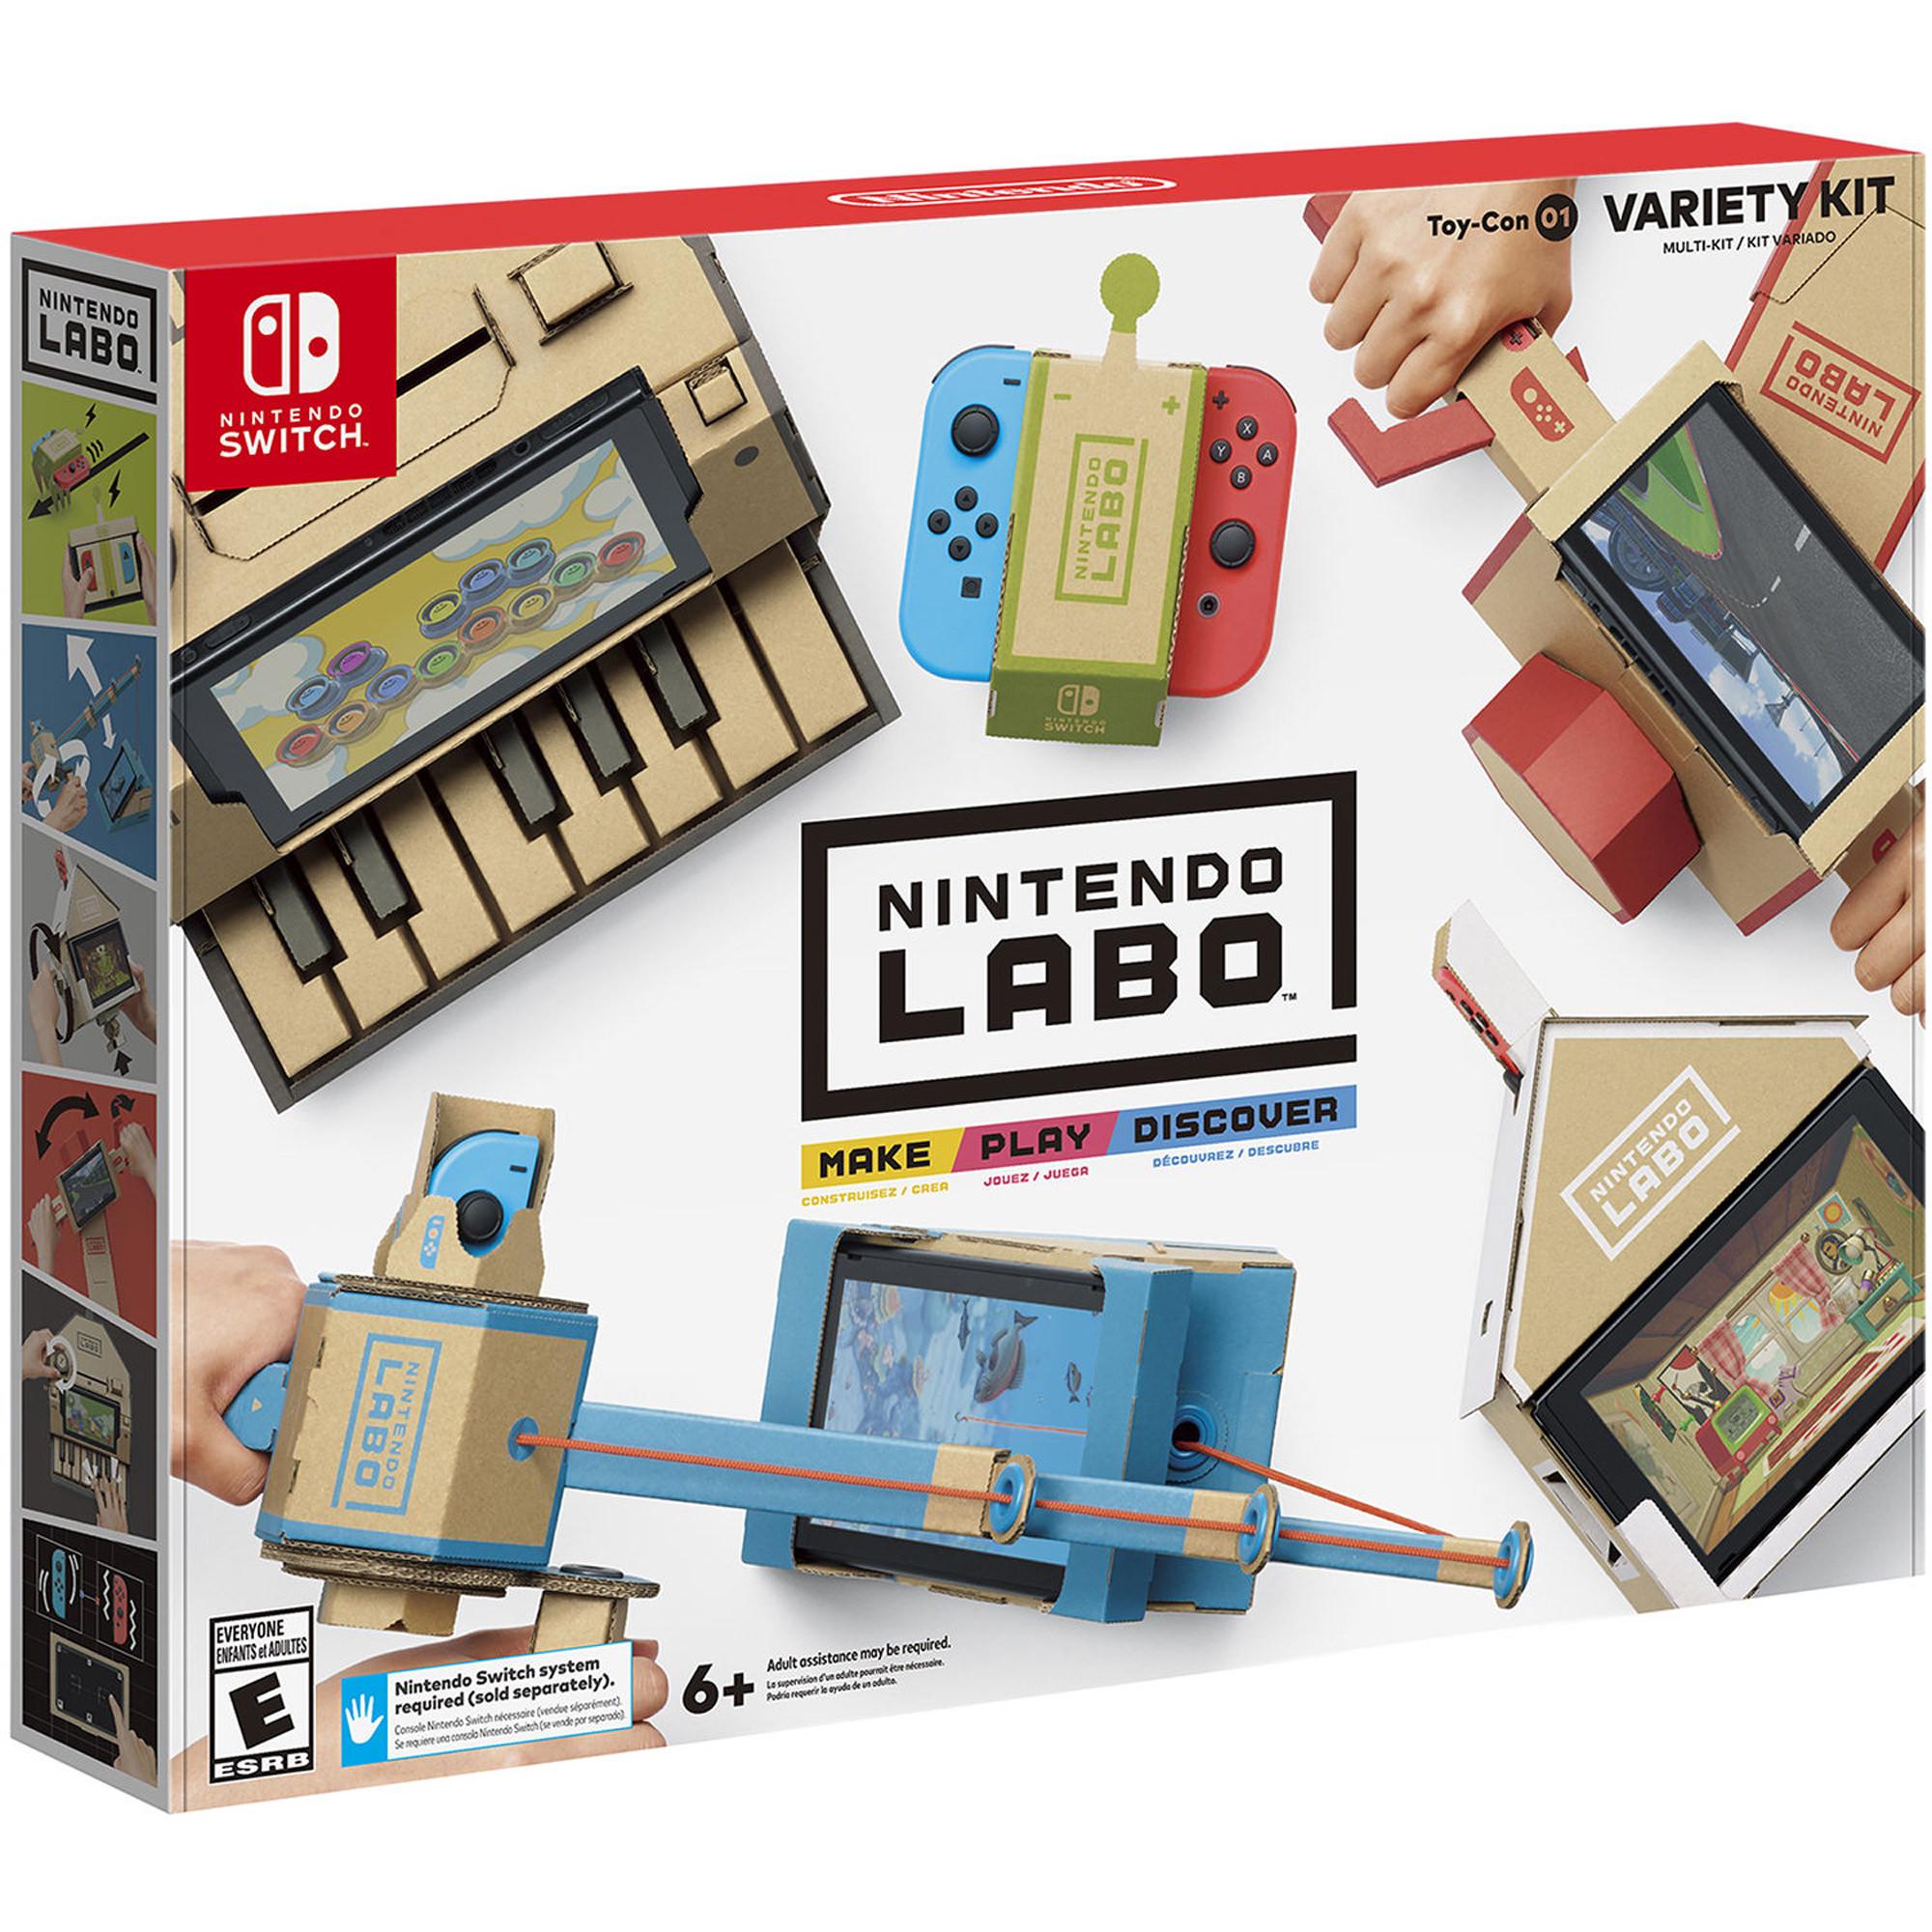 Nintendo Labo Variety and other Kits - Walmart B&M - YMMV $9